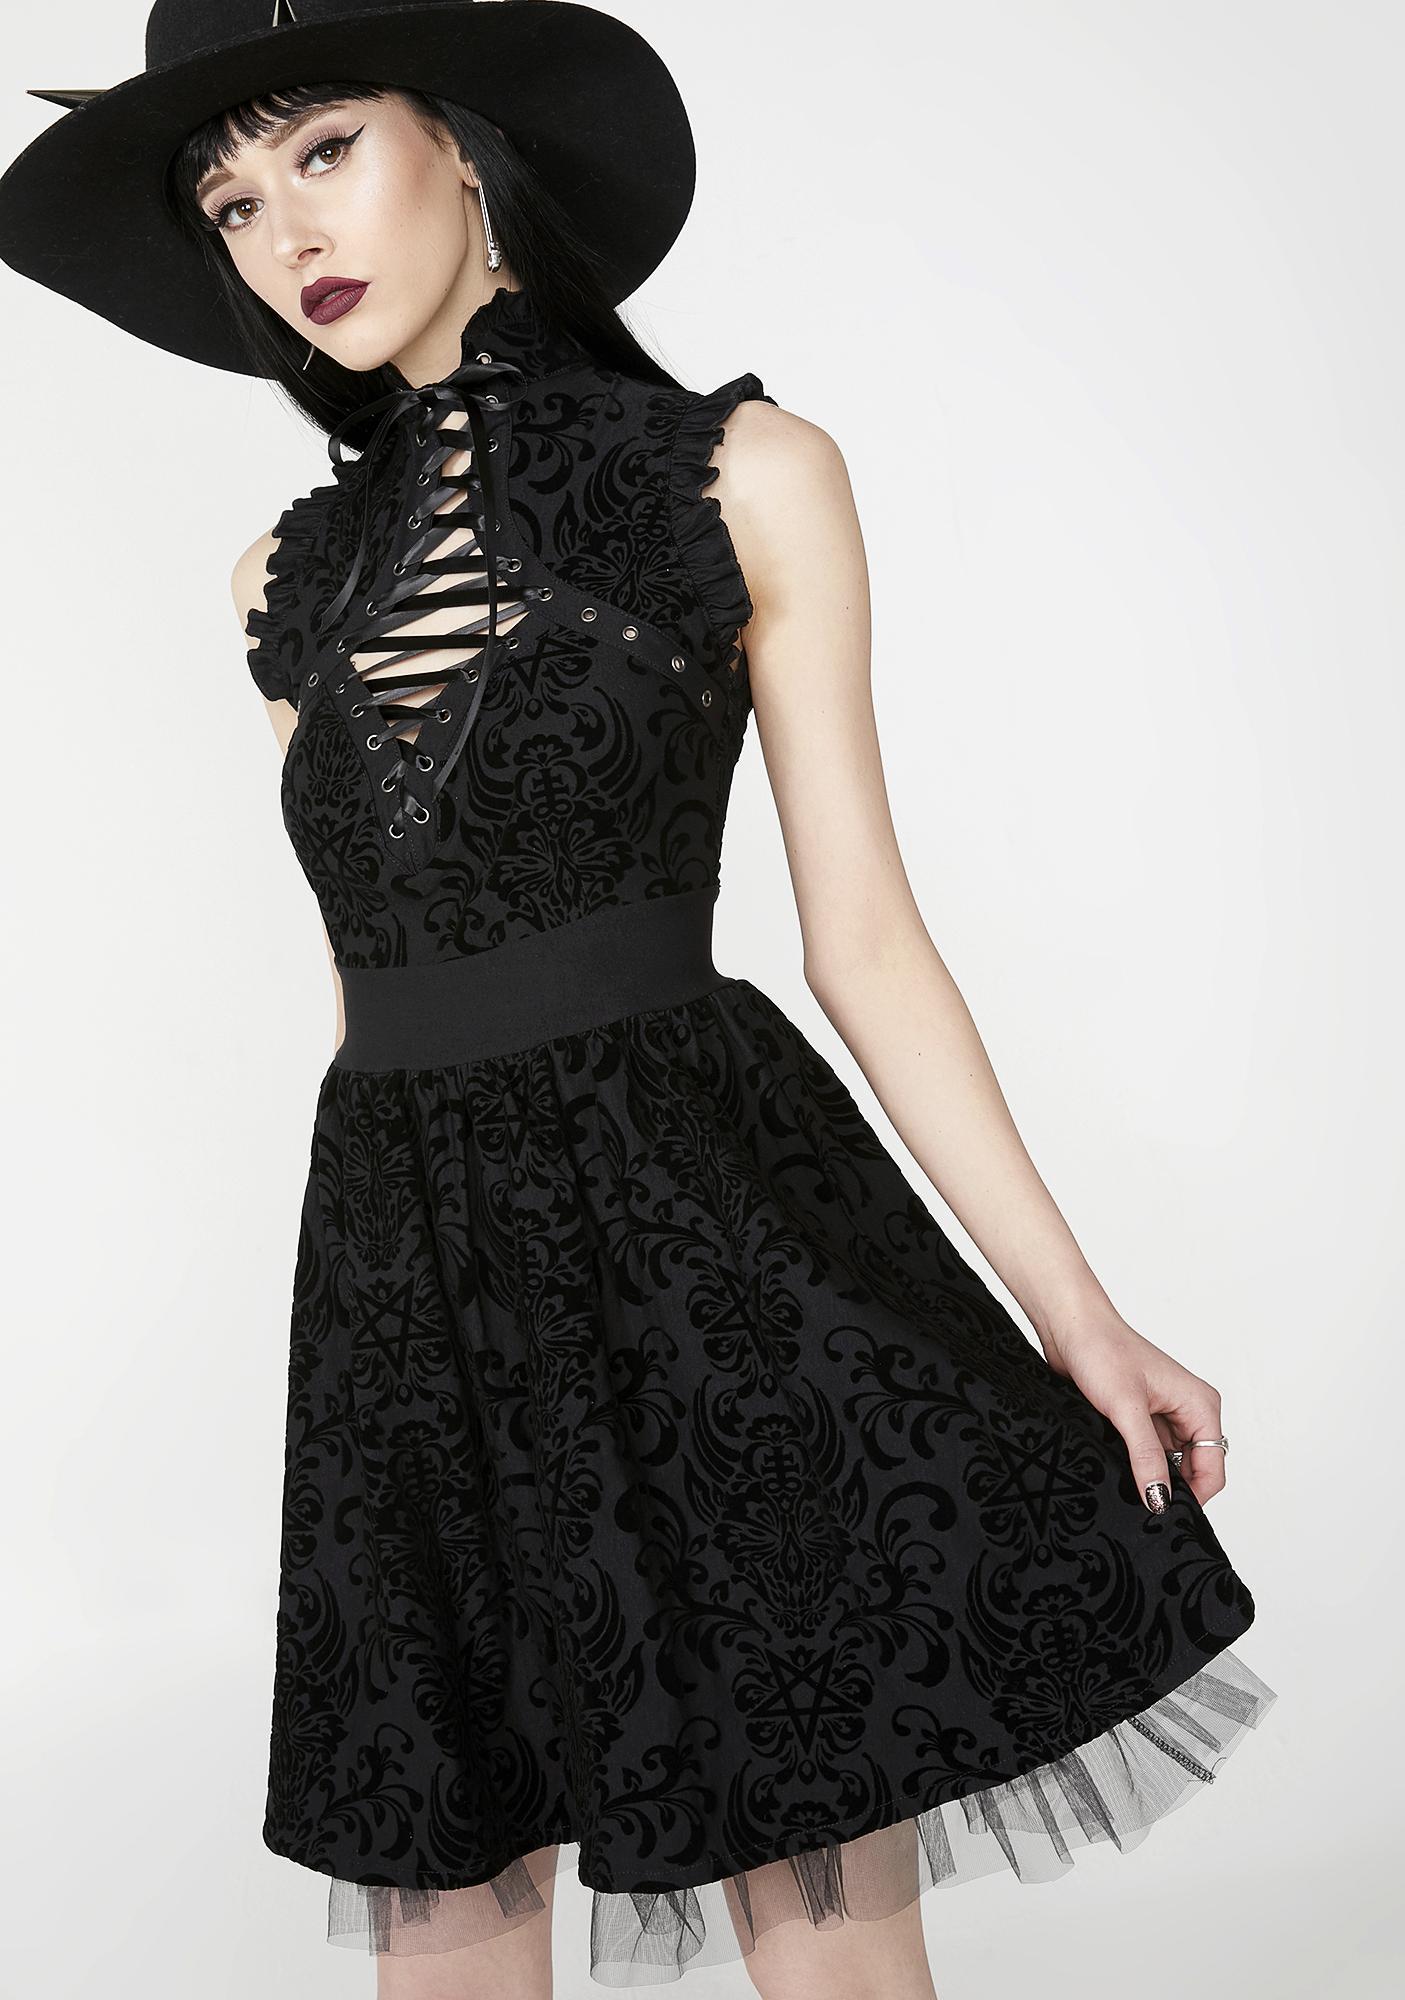 Killstar Bloodlust Party Dress